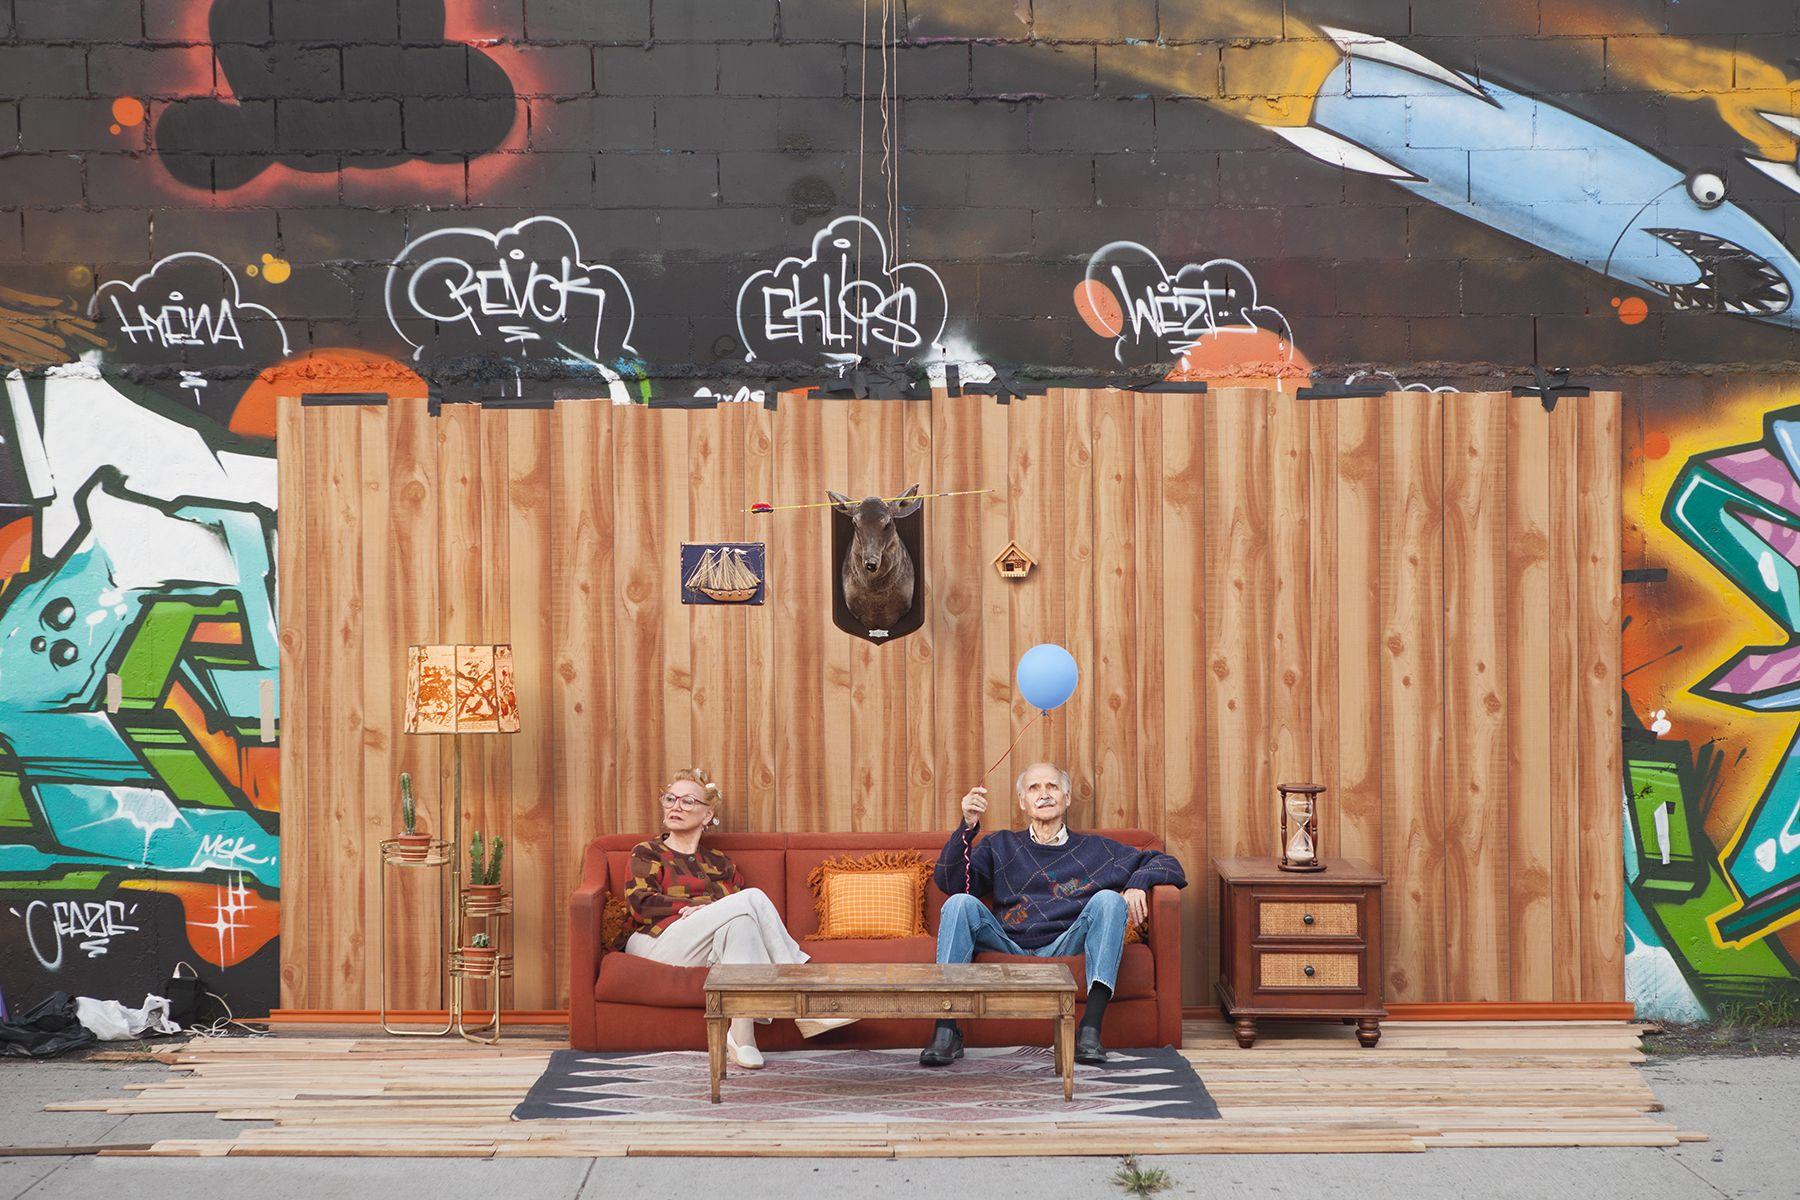 set-in-the-street-outdoor-rooms-in-new-york-city-3